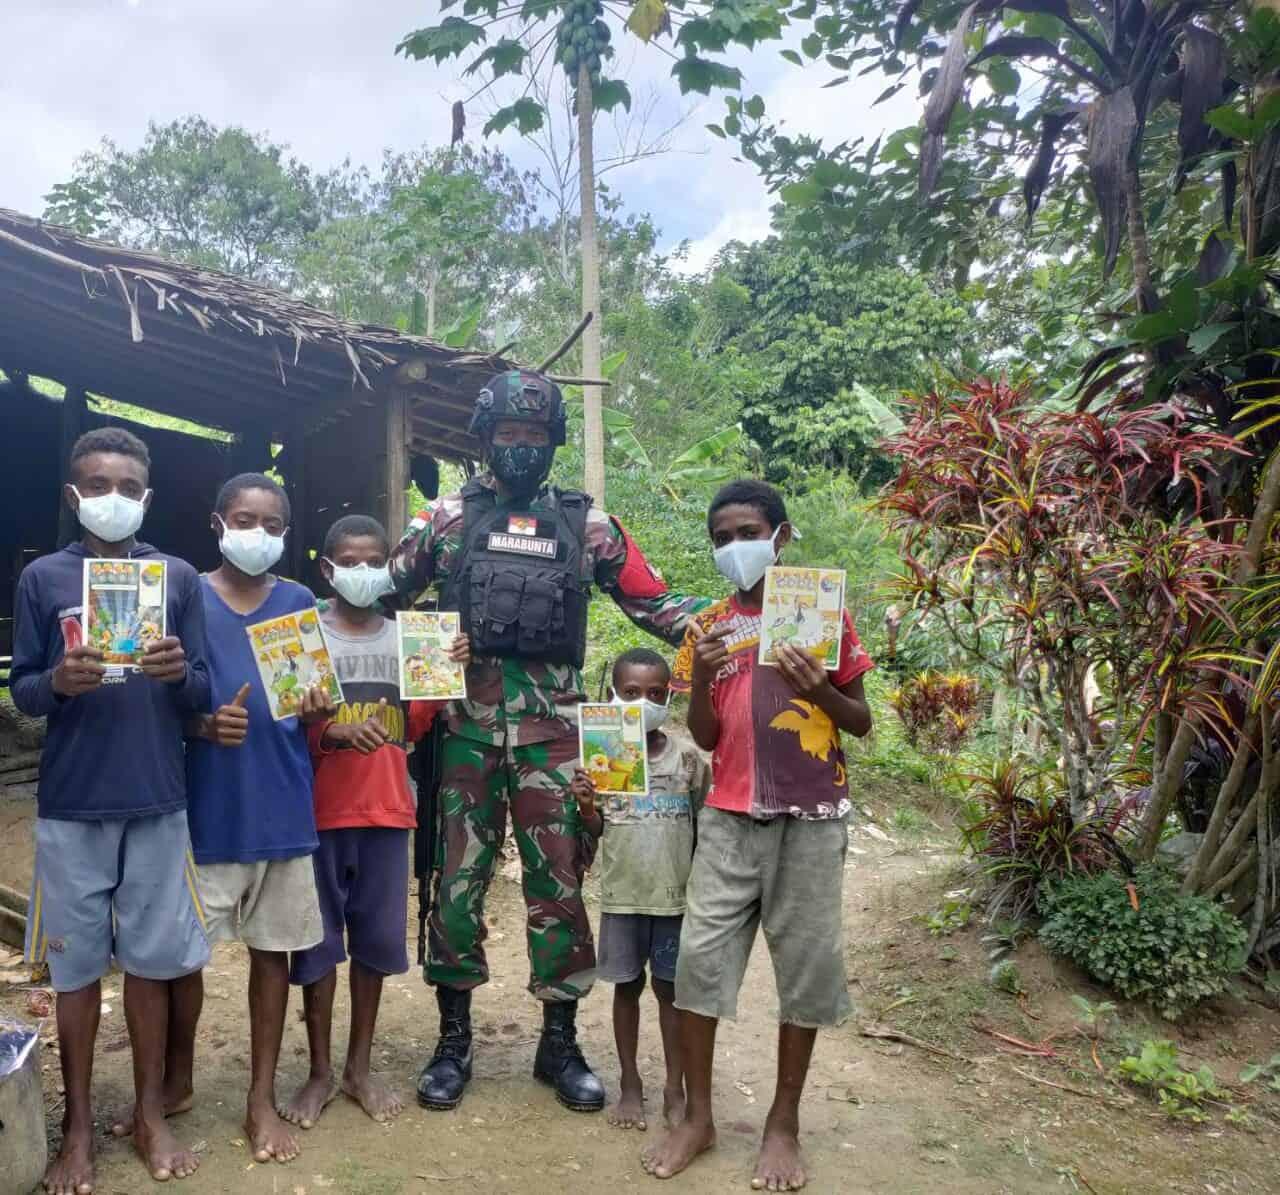 Kunjungi Anak-anak di Kampung Perbatasan, Satgas Yonif 512/QY Bagikan Buku dan Alat Tulis